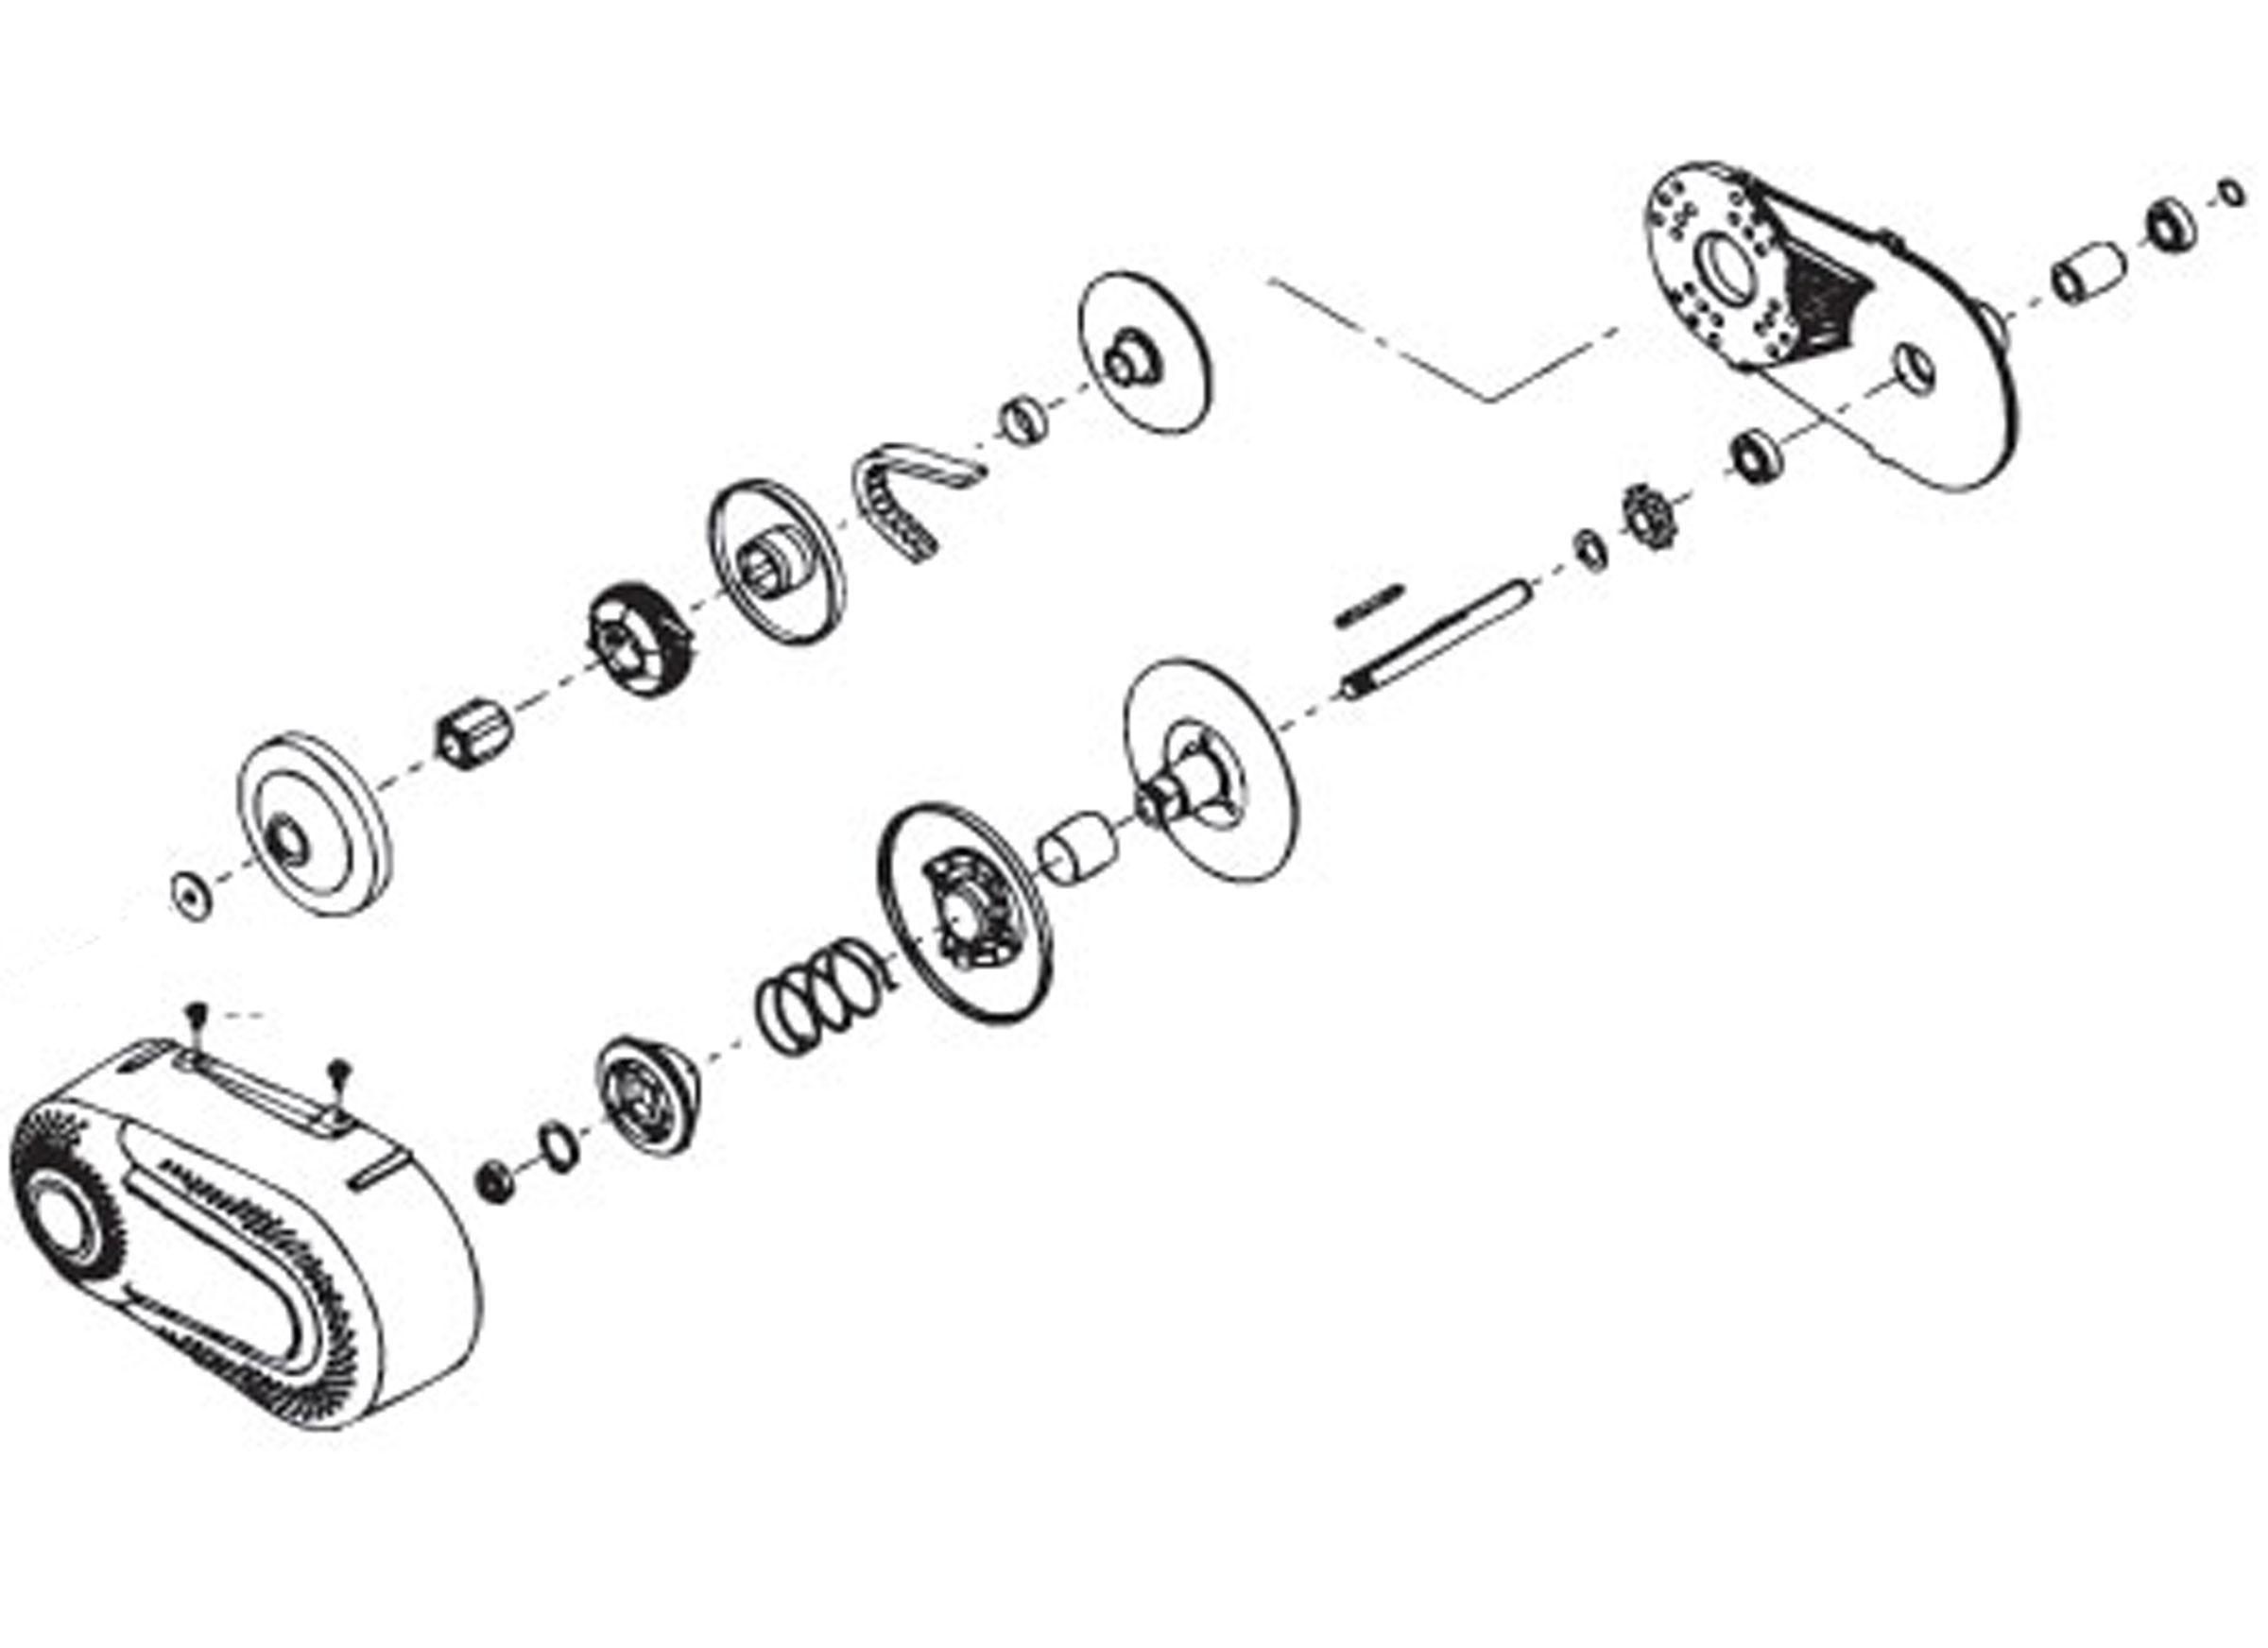 Torque Converter For  35 Chain  1 U0026quot  Bore  Tav2 Replacement